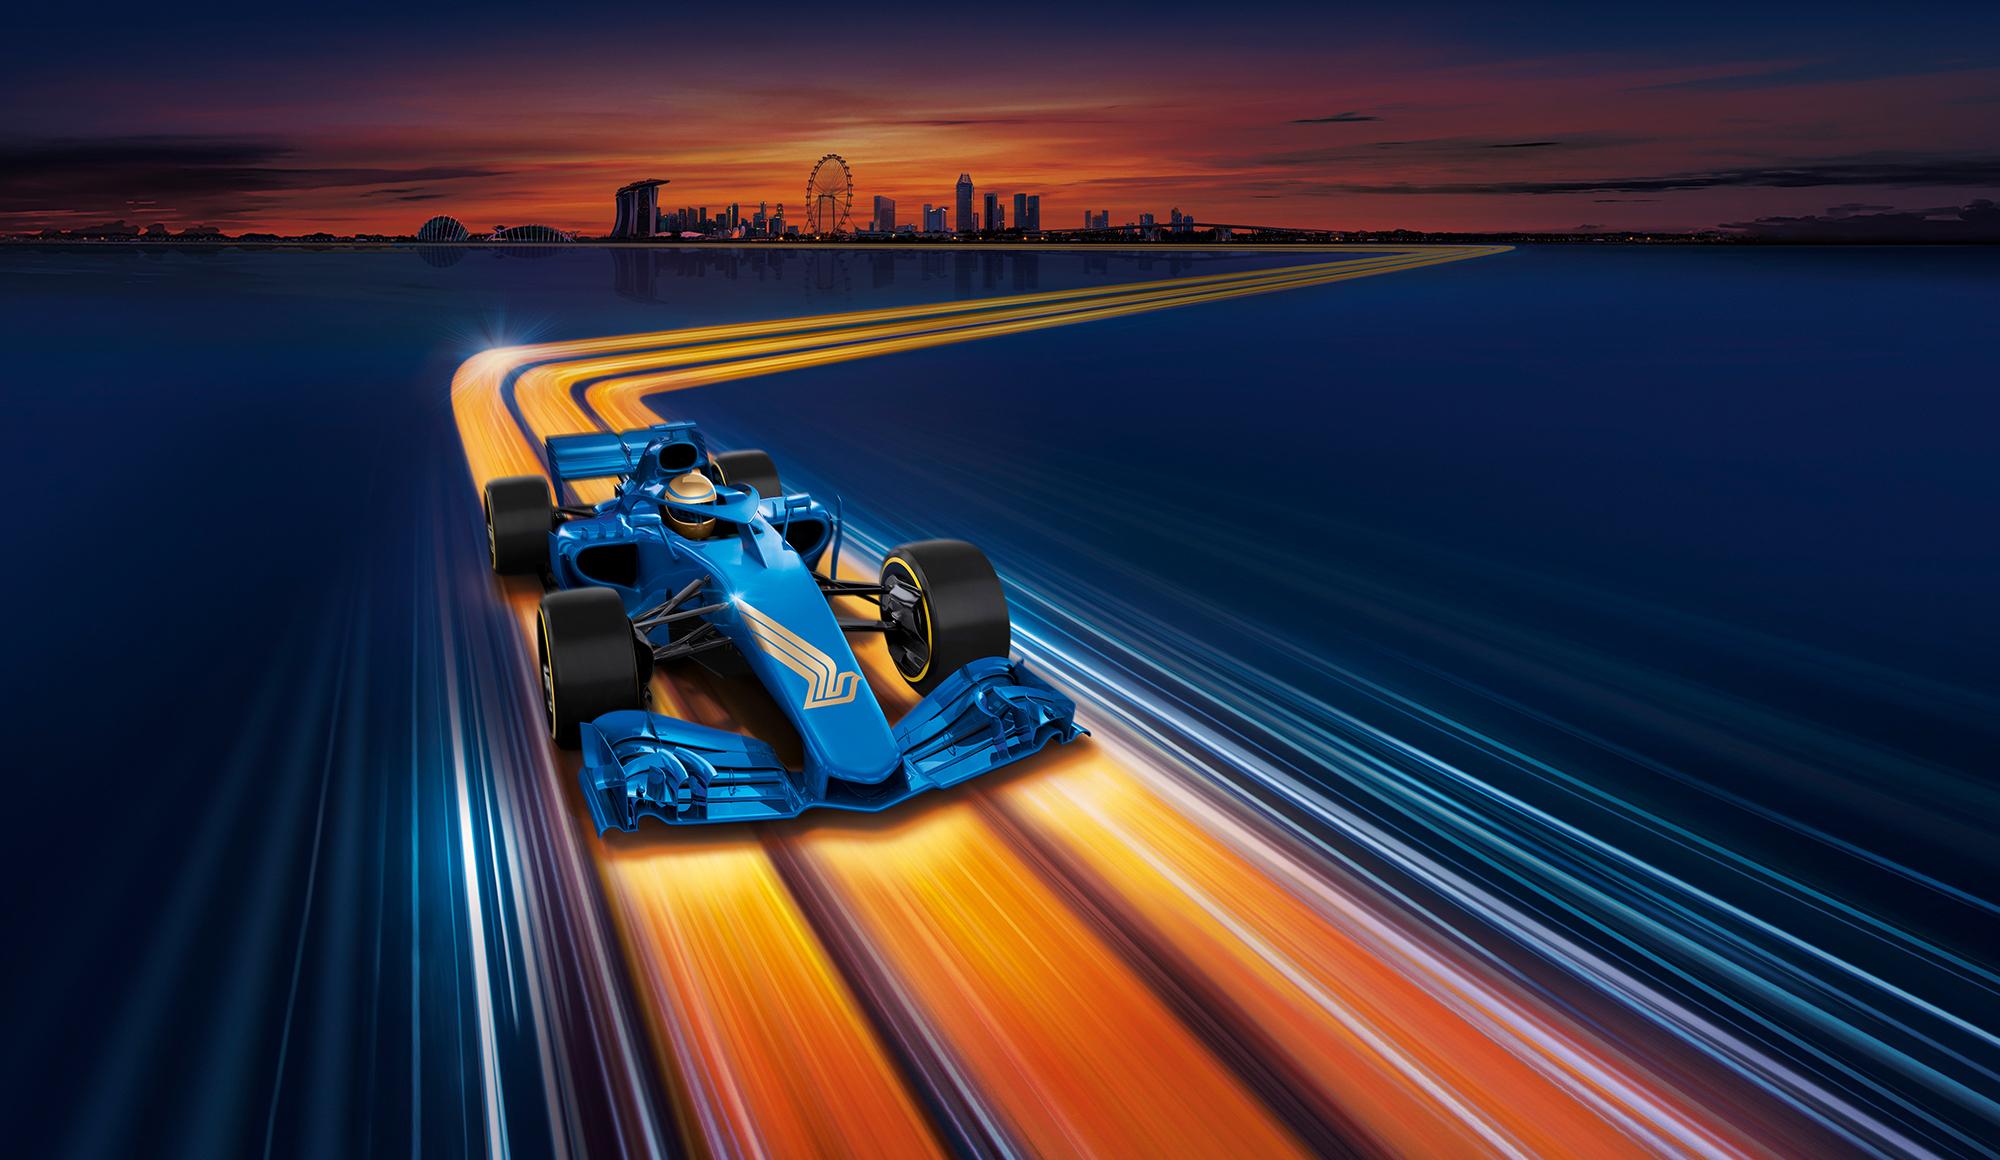 Up to 5.5 bonus KrisFlyer miles per dollar on 2019 Singapore F1 tickets